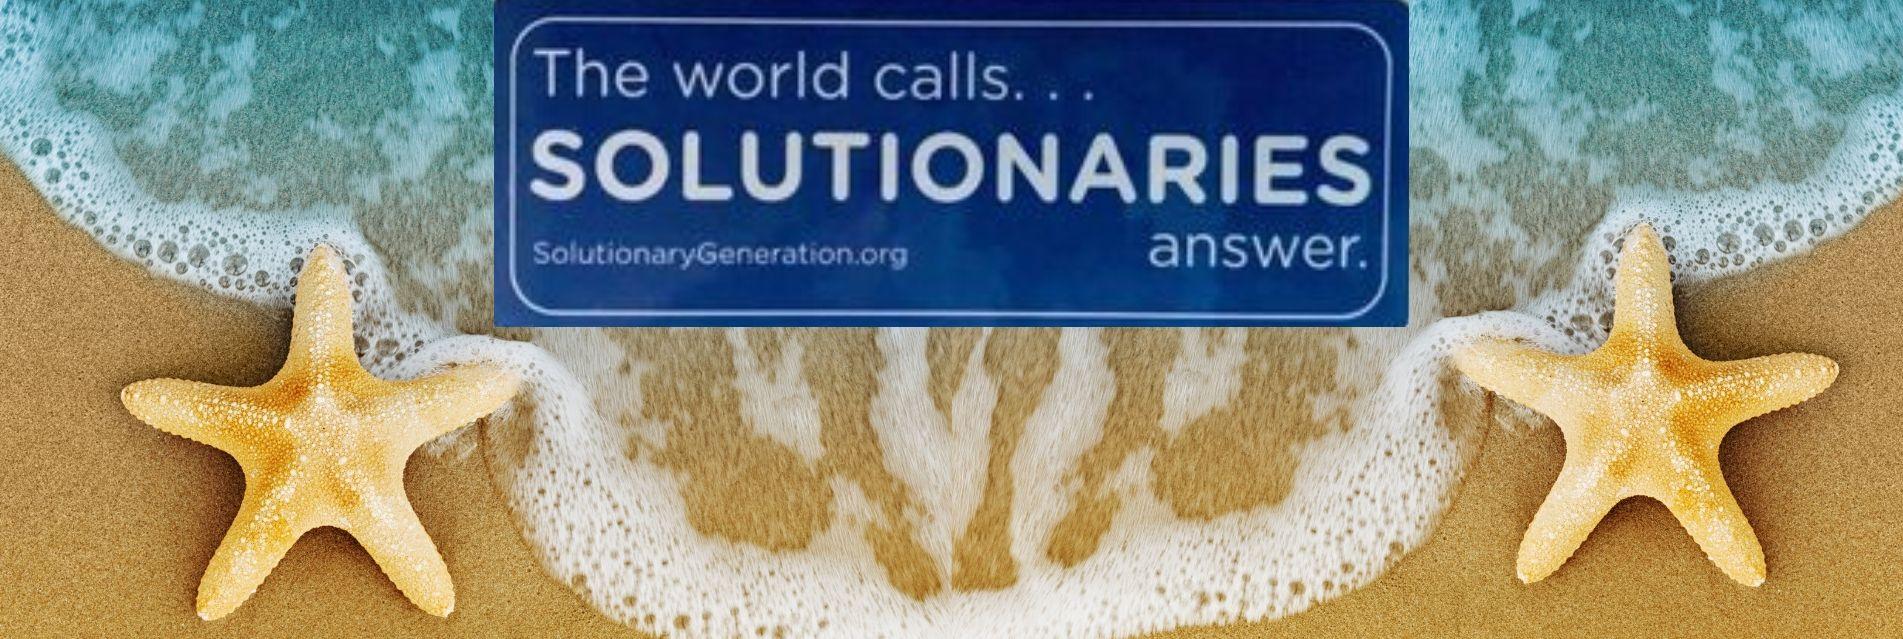 solutionary